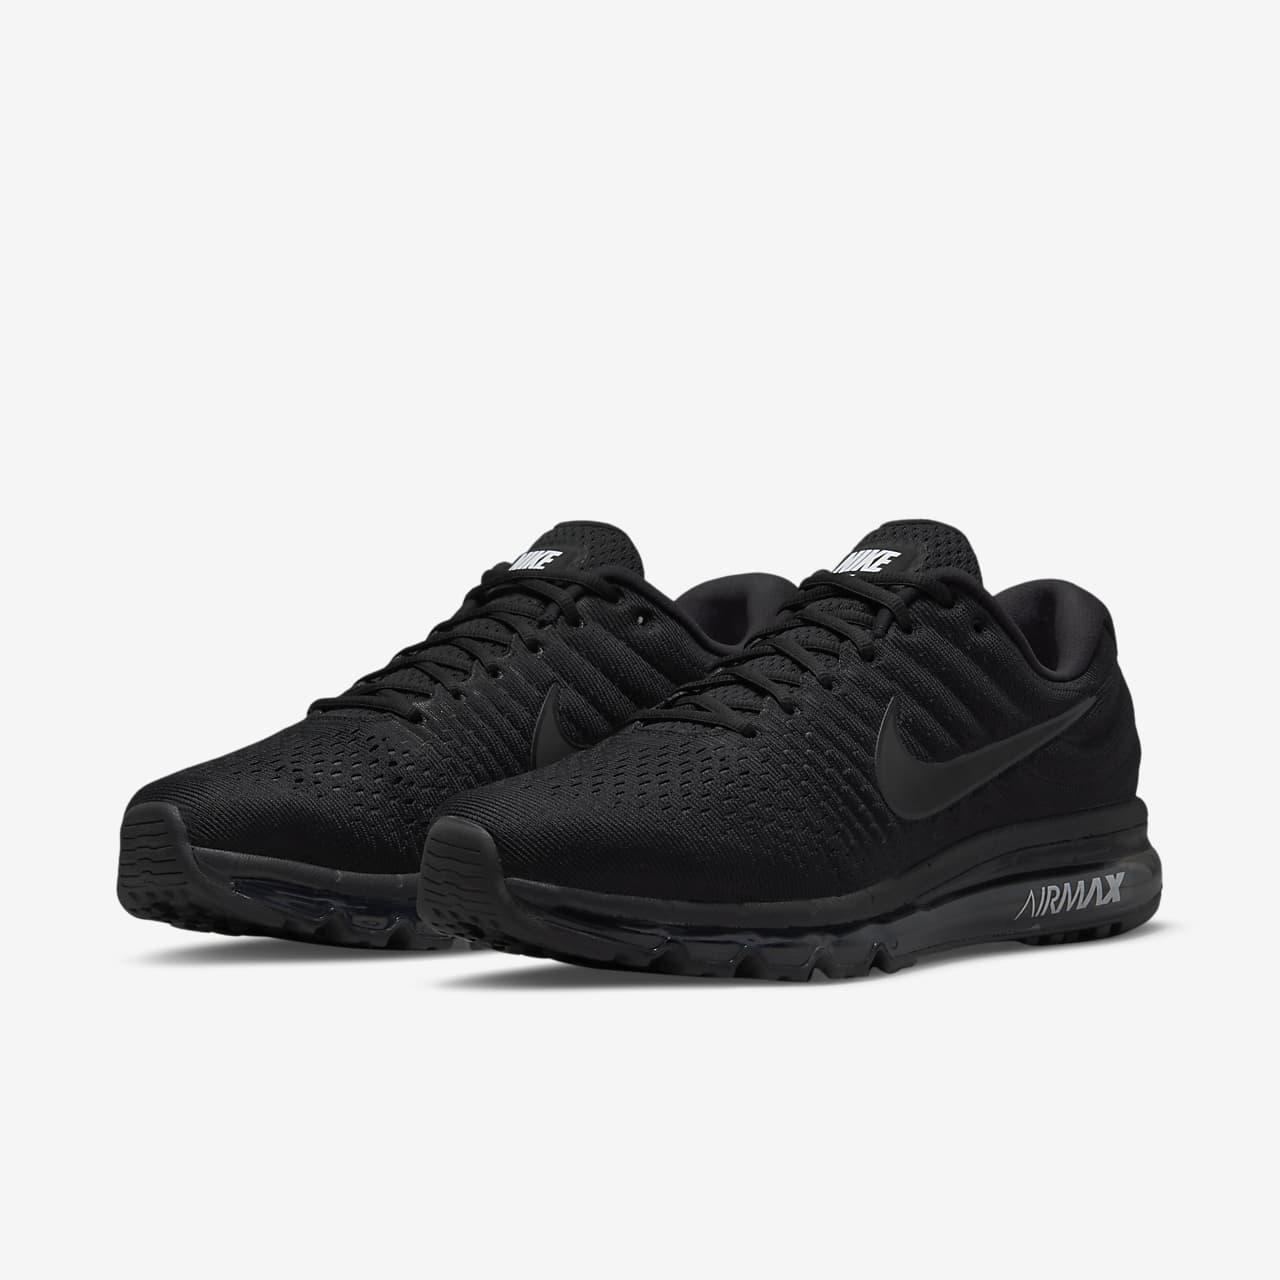 promo code 3993c f0407 ... Мужские кроссовки Nike Air Max 2017